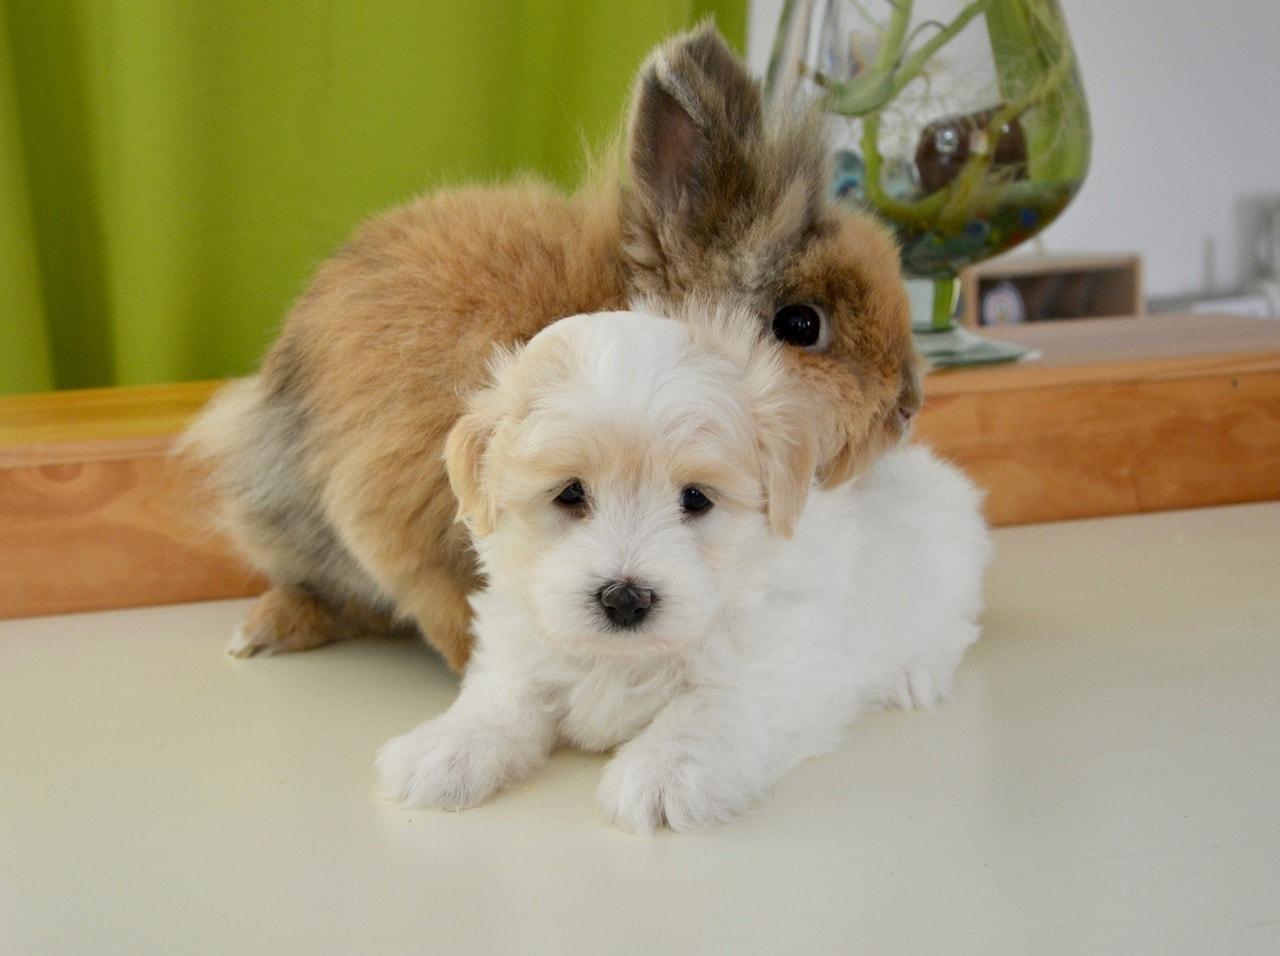 domestic rabbit hugging a white puppy